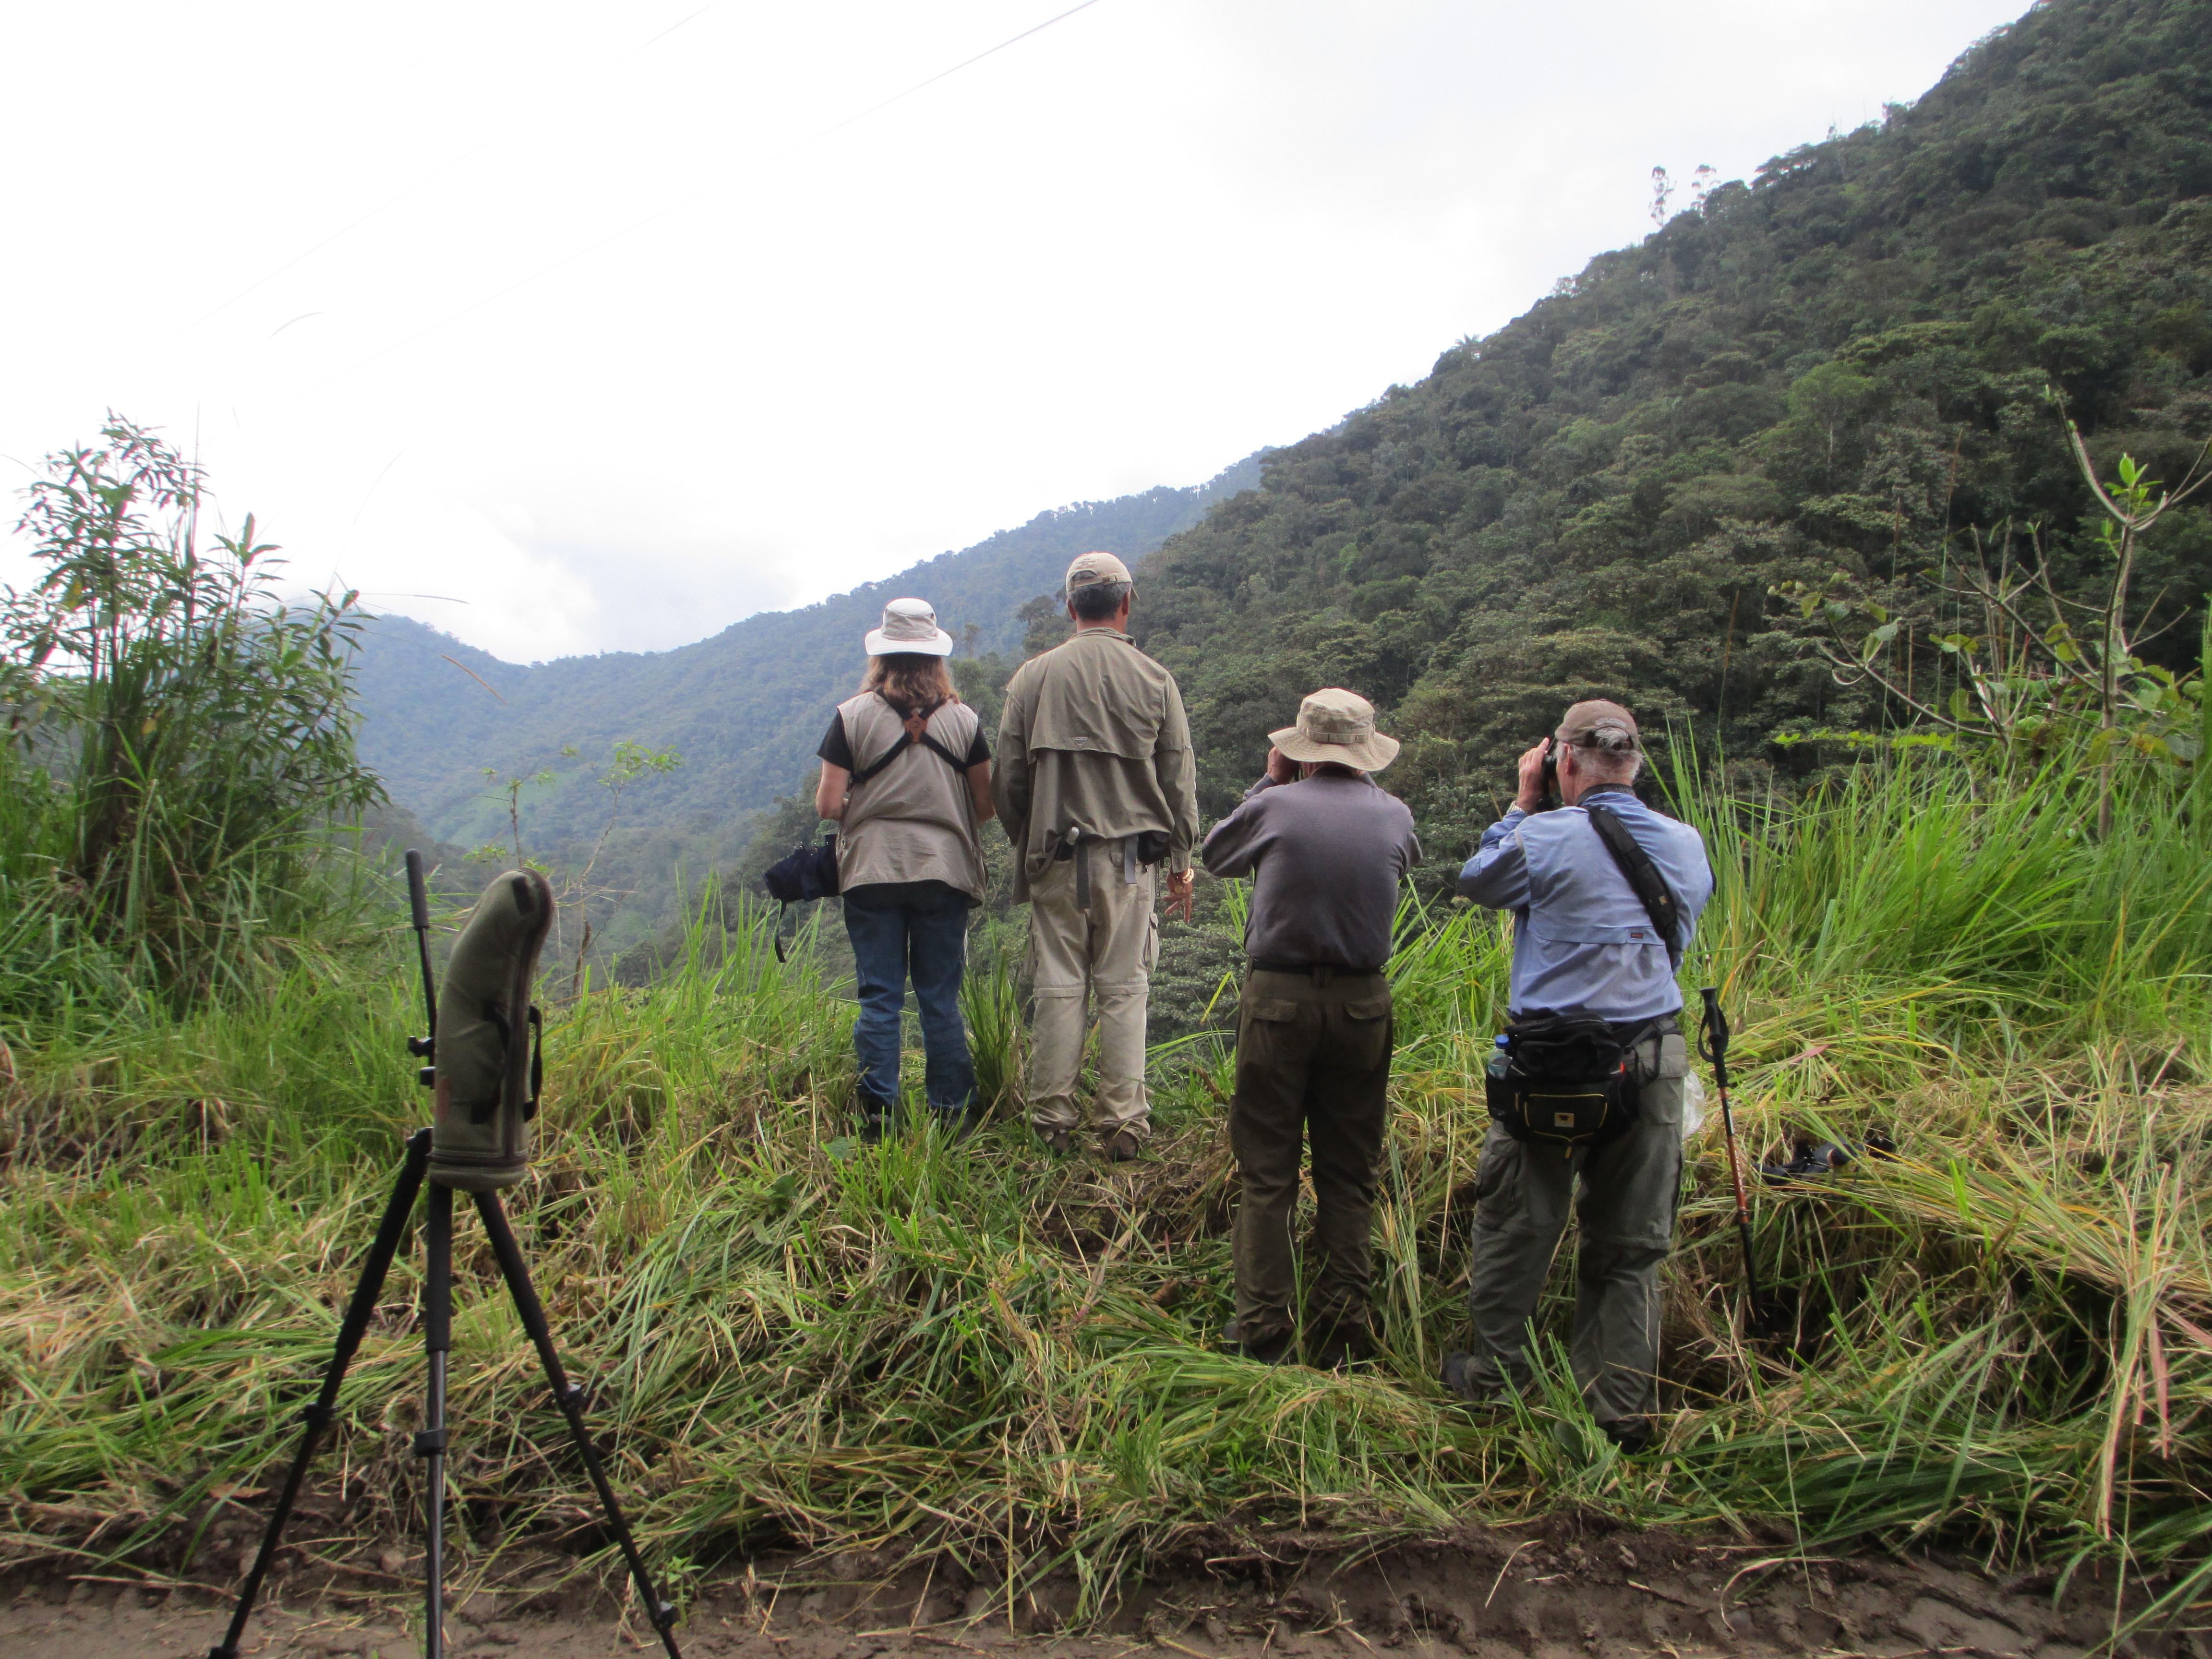 Birding in the Tandayapa Valley